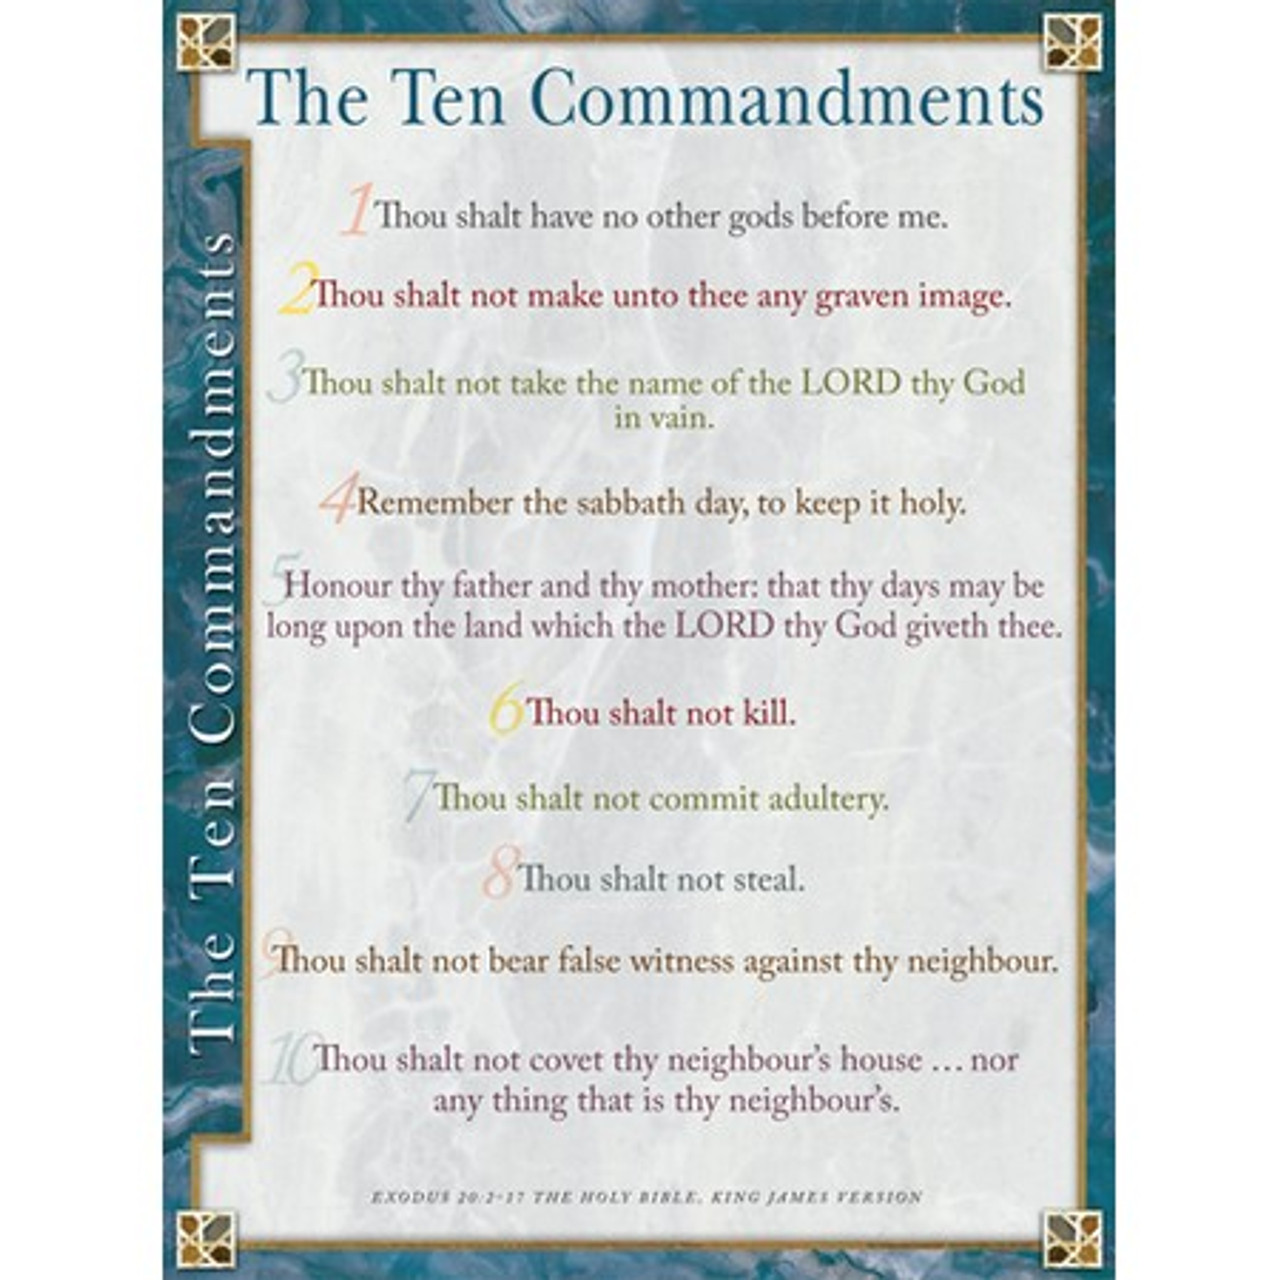 picture regarding 10 Commandments Kjv Printable identify 10 Commandments KJV Wall Chart - Laminated